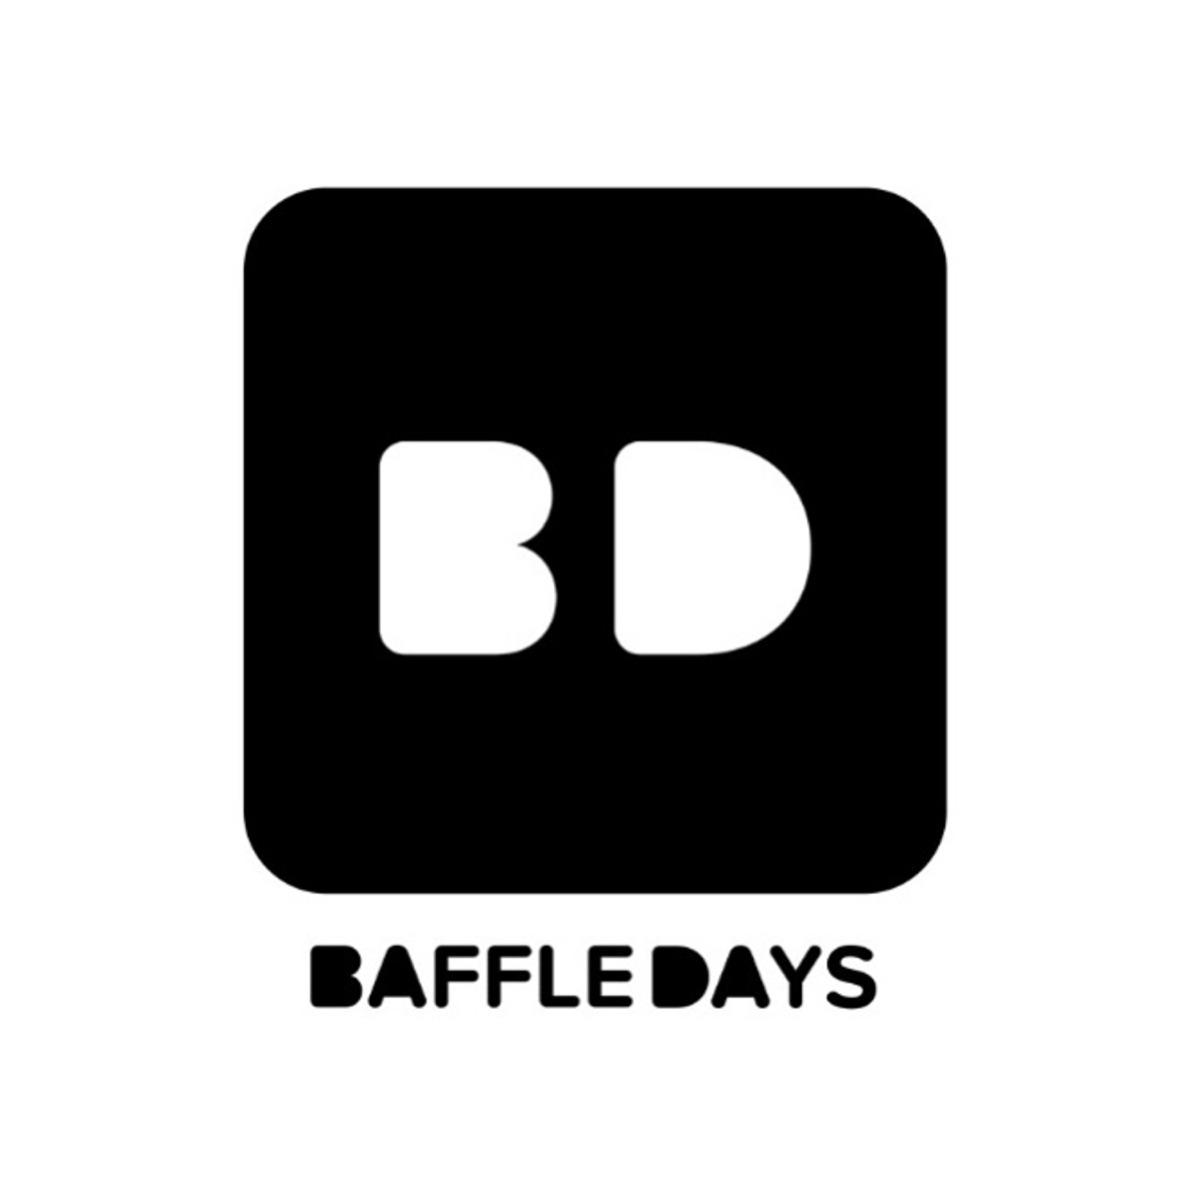 BAFFLE DAYS